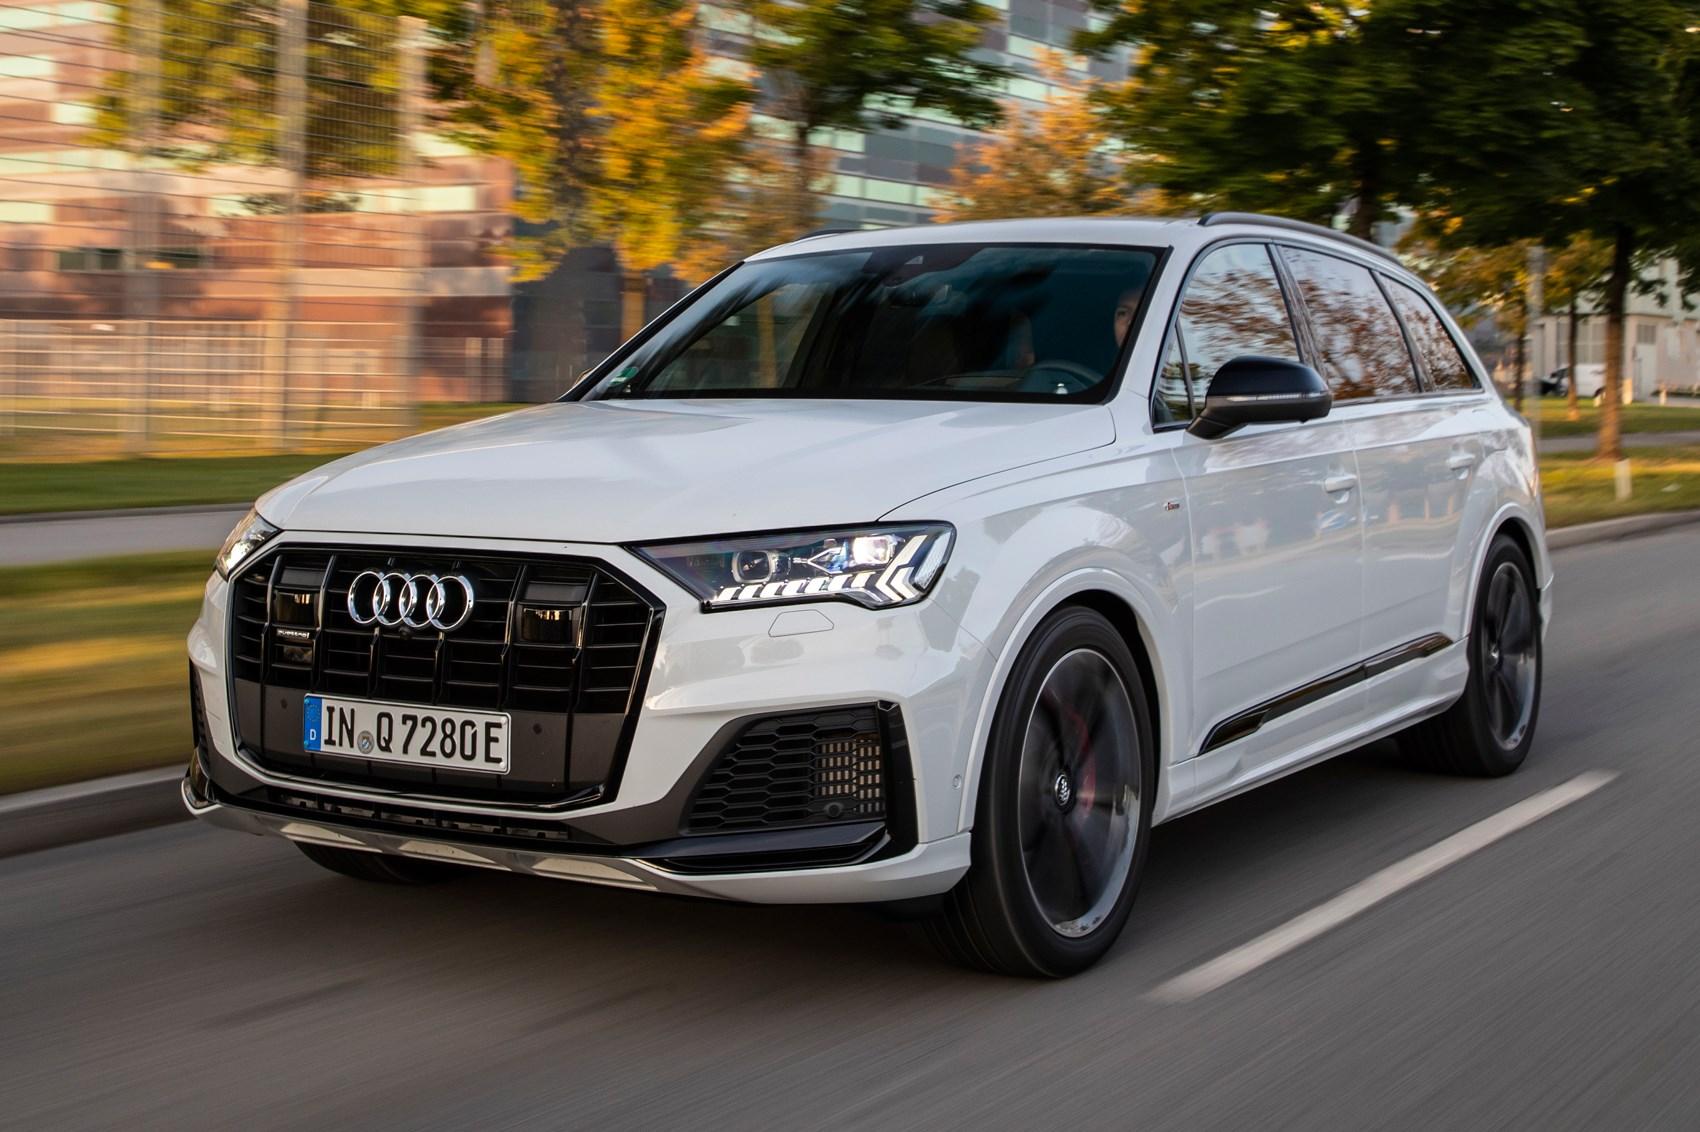 Kelebihan Kekurangan Audi Q7 Etron Murah Berkualitas